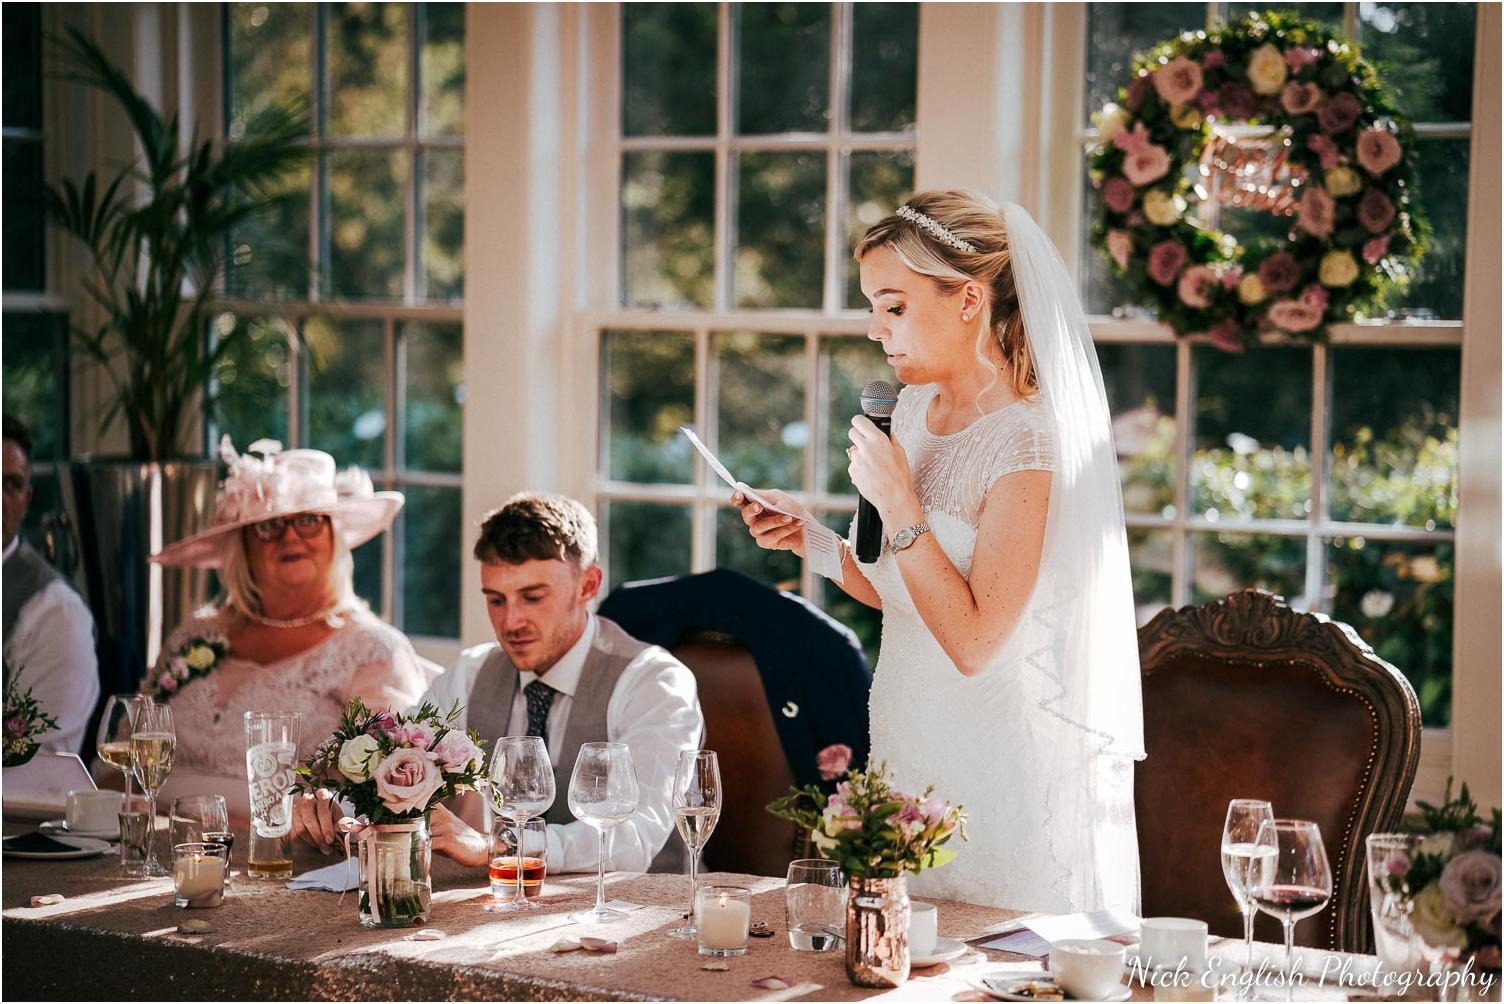 Mitton_Hall_Wedding_Photograph-157.jpg